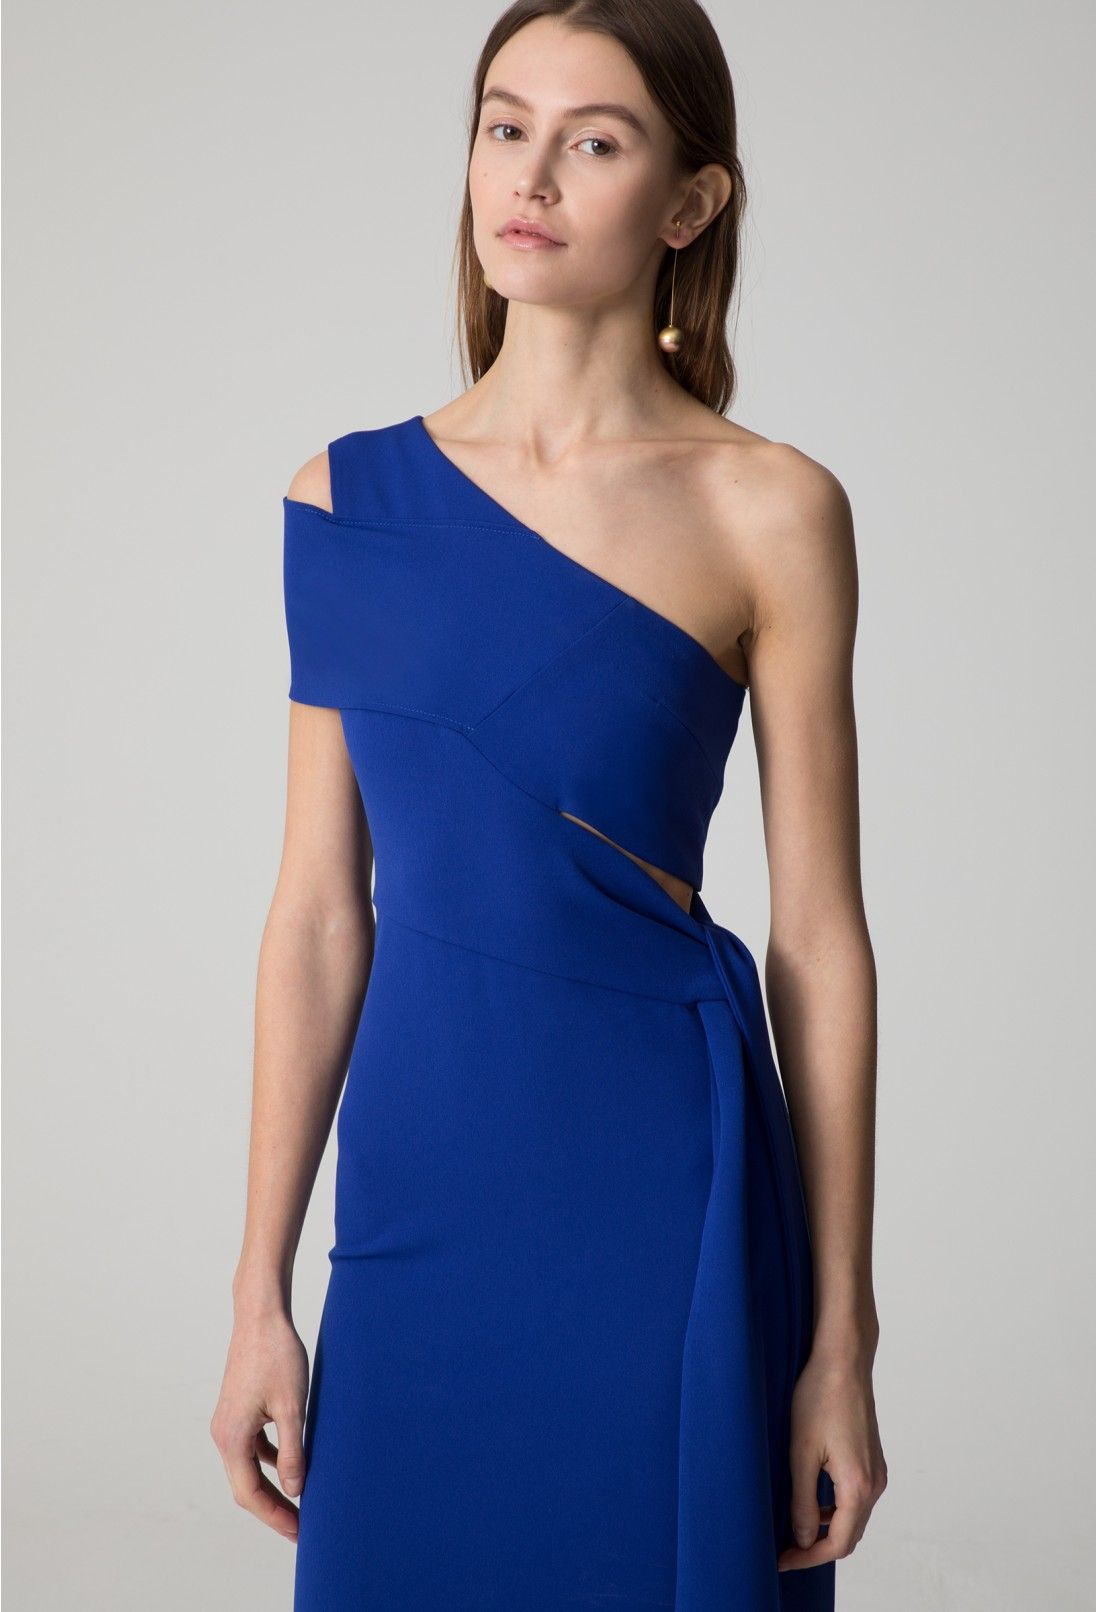 eee82a27e0 Lolita One Shoulder Midi Dress - Blue-UK 4 in 2019   Bridal Luncheon ...